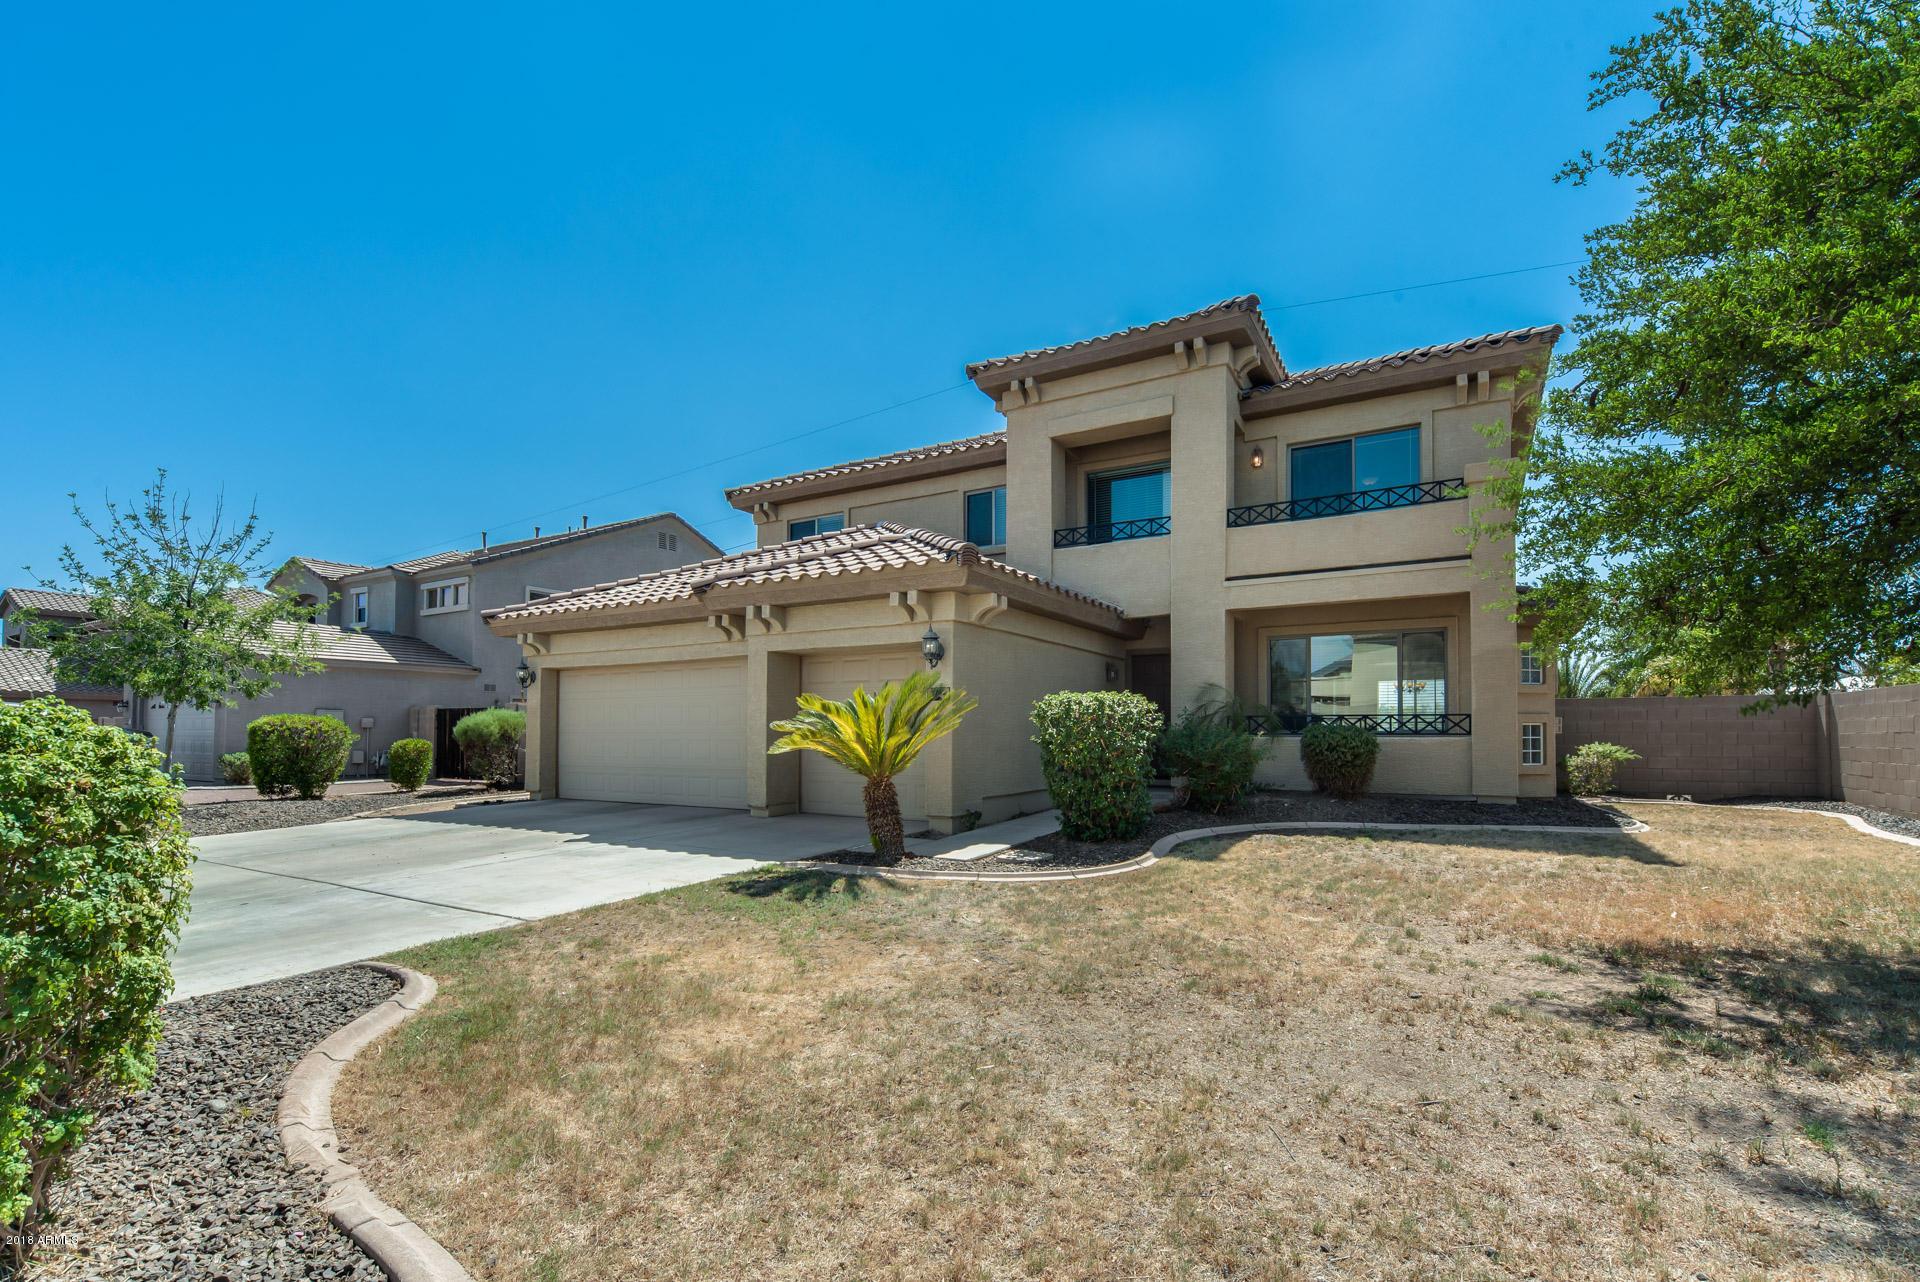 Photo of 4742 S ADELLE Circle, Mesa, AZ 85212